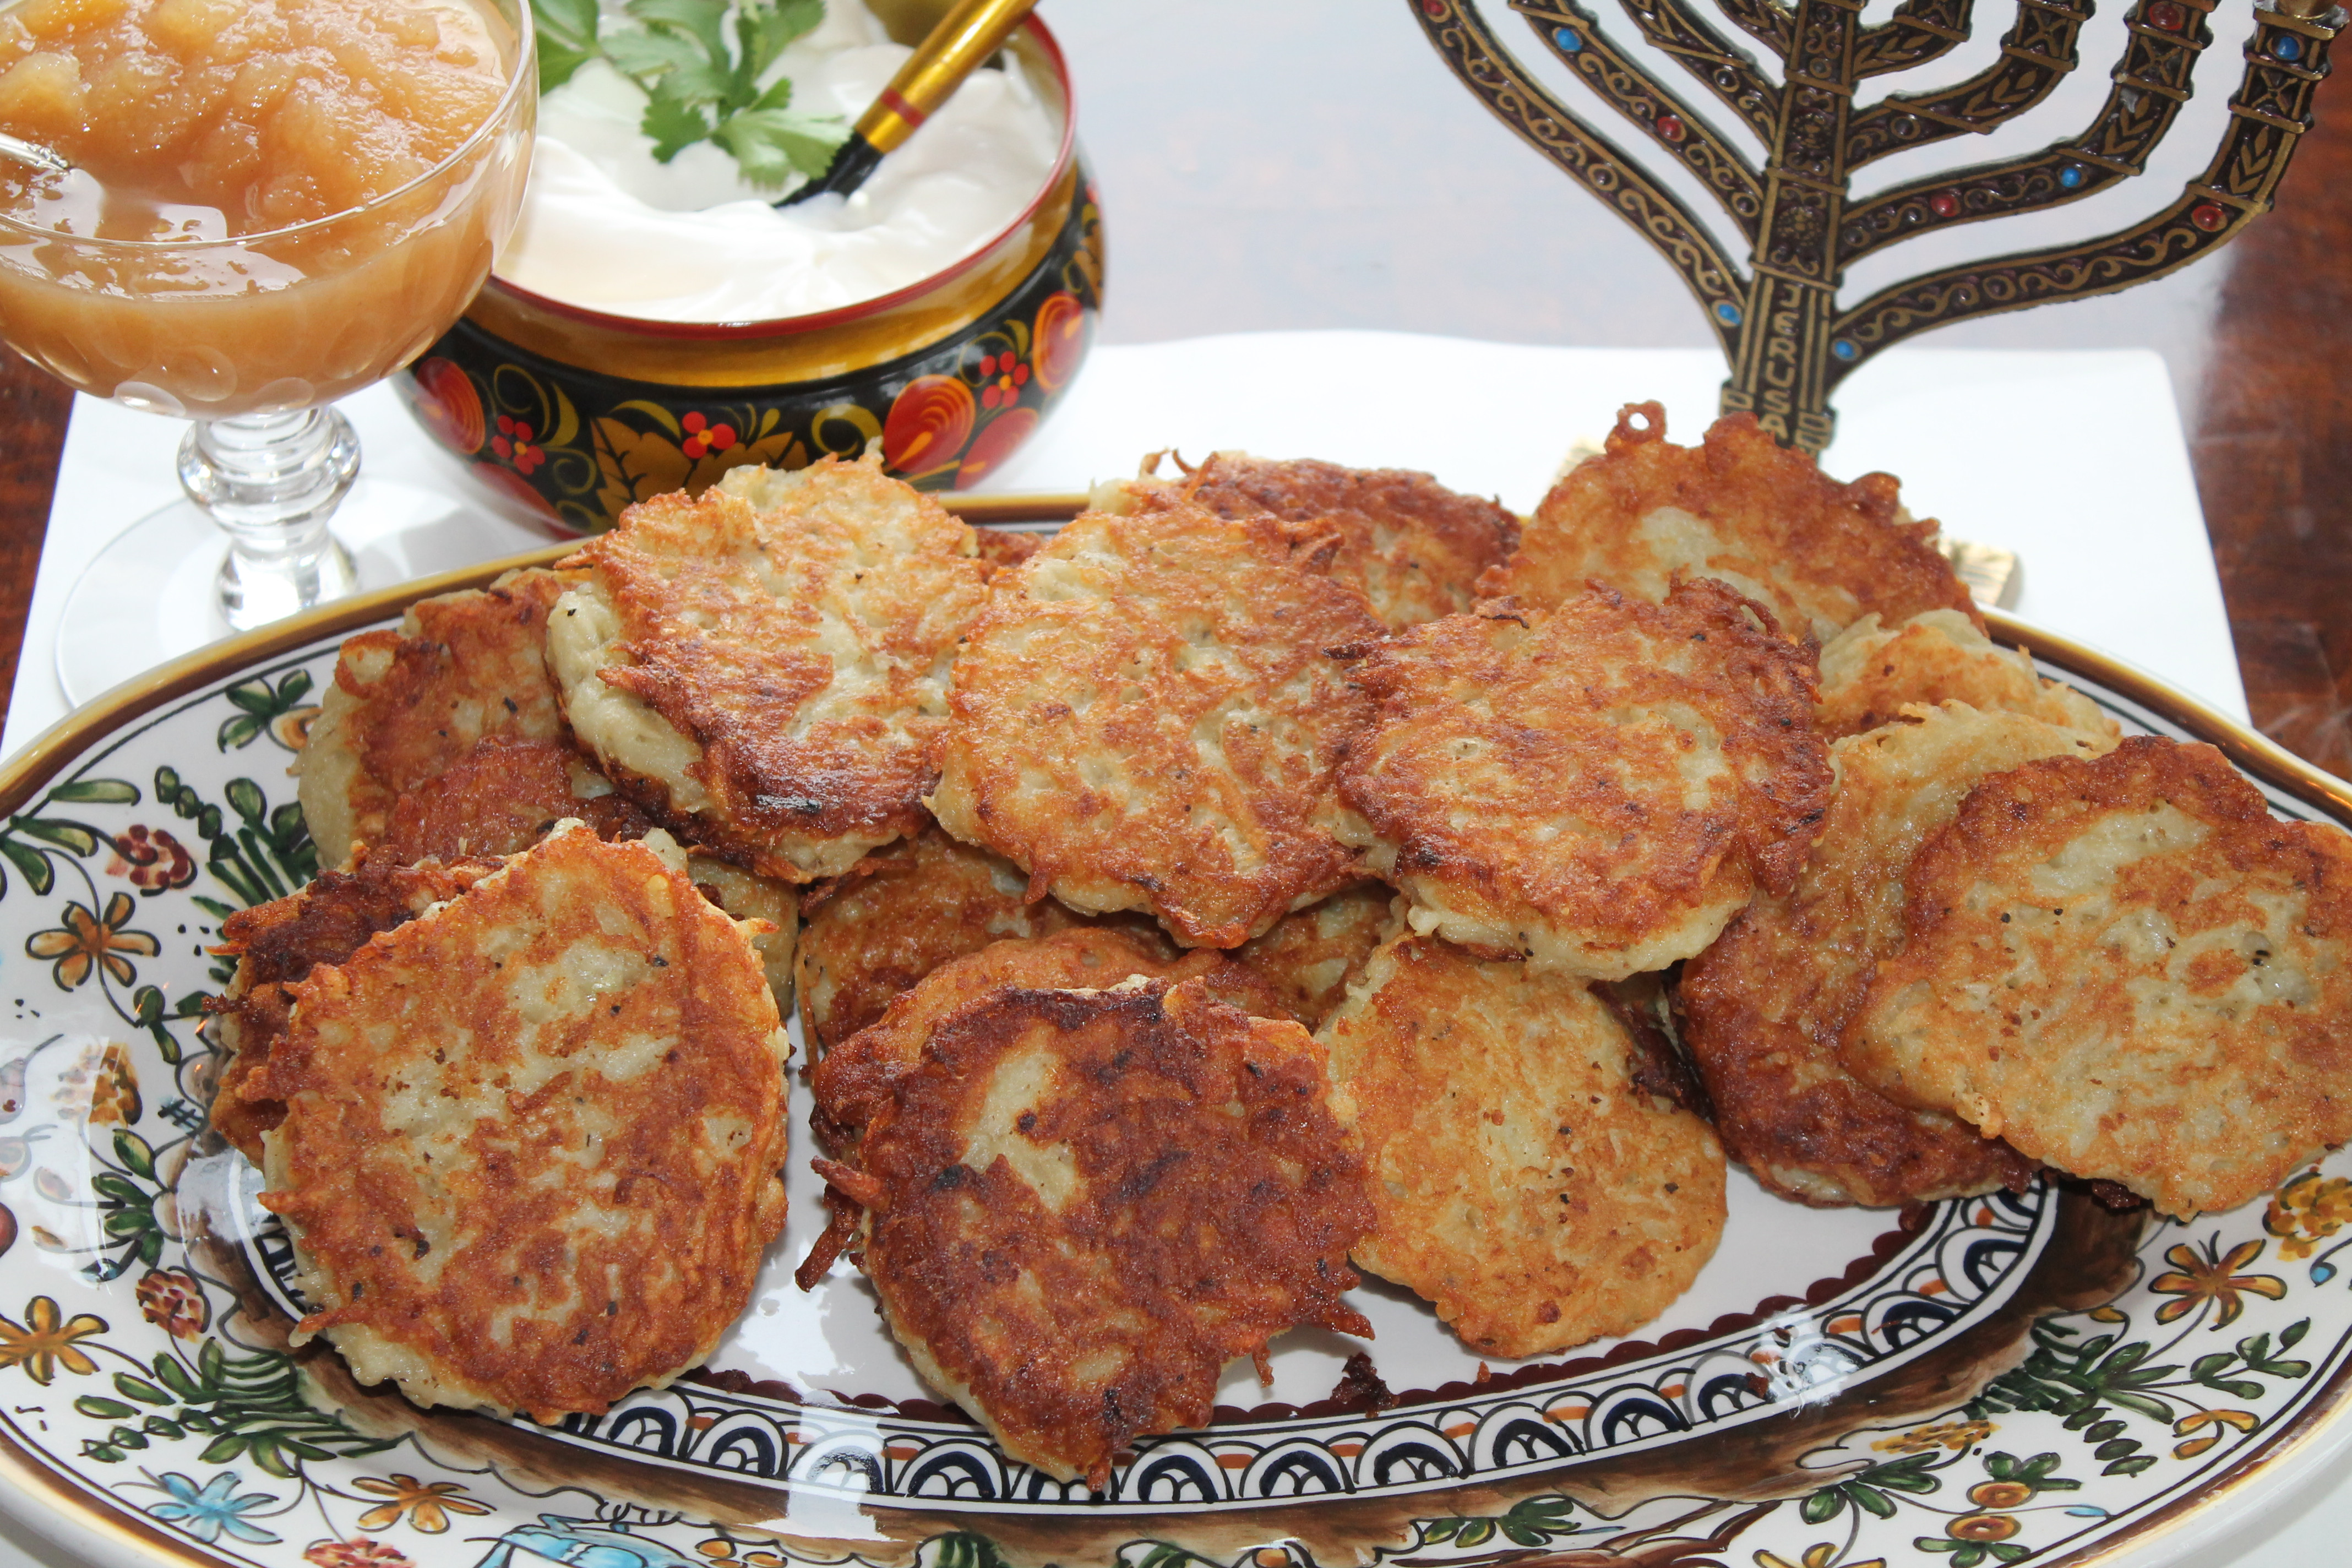 Hanukkah Potato Latkes  Potato Latkes for Hanukkah with Pat Goodman Spiced Peach